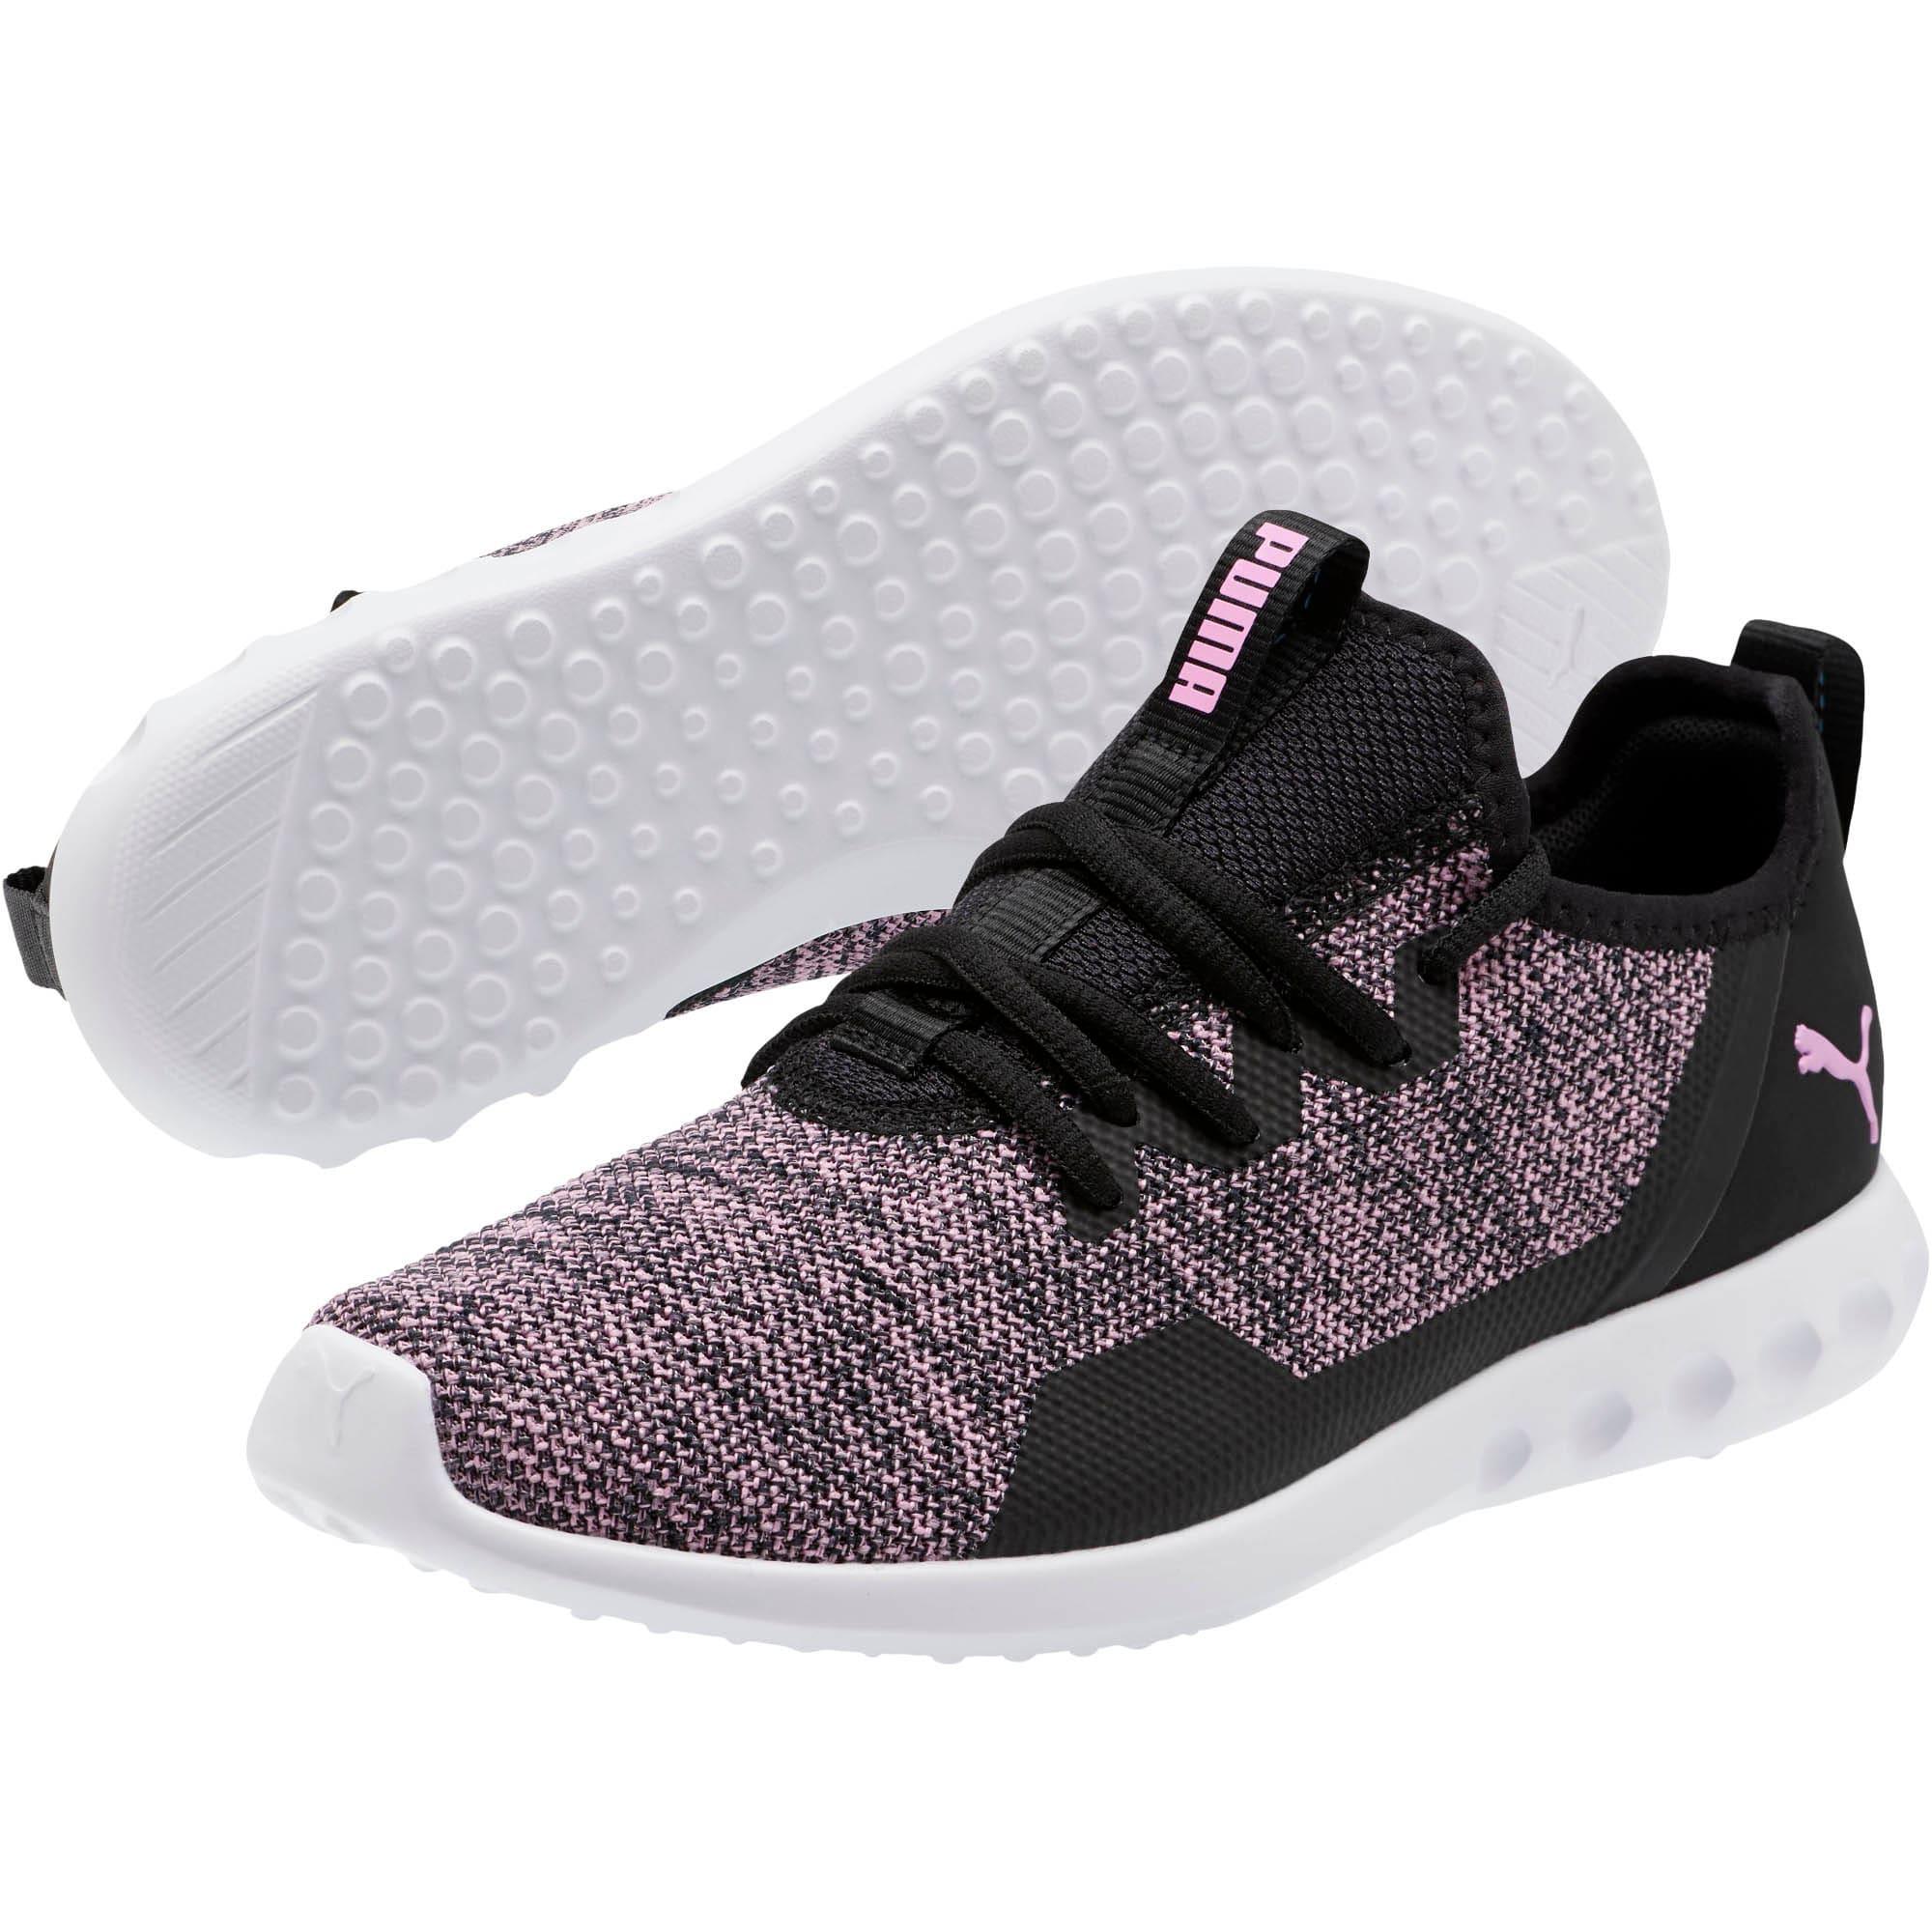 Thumbnail 2 of Carson 2 X Knit Women's Running Shoes, Puma Black-Orchid, medium